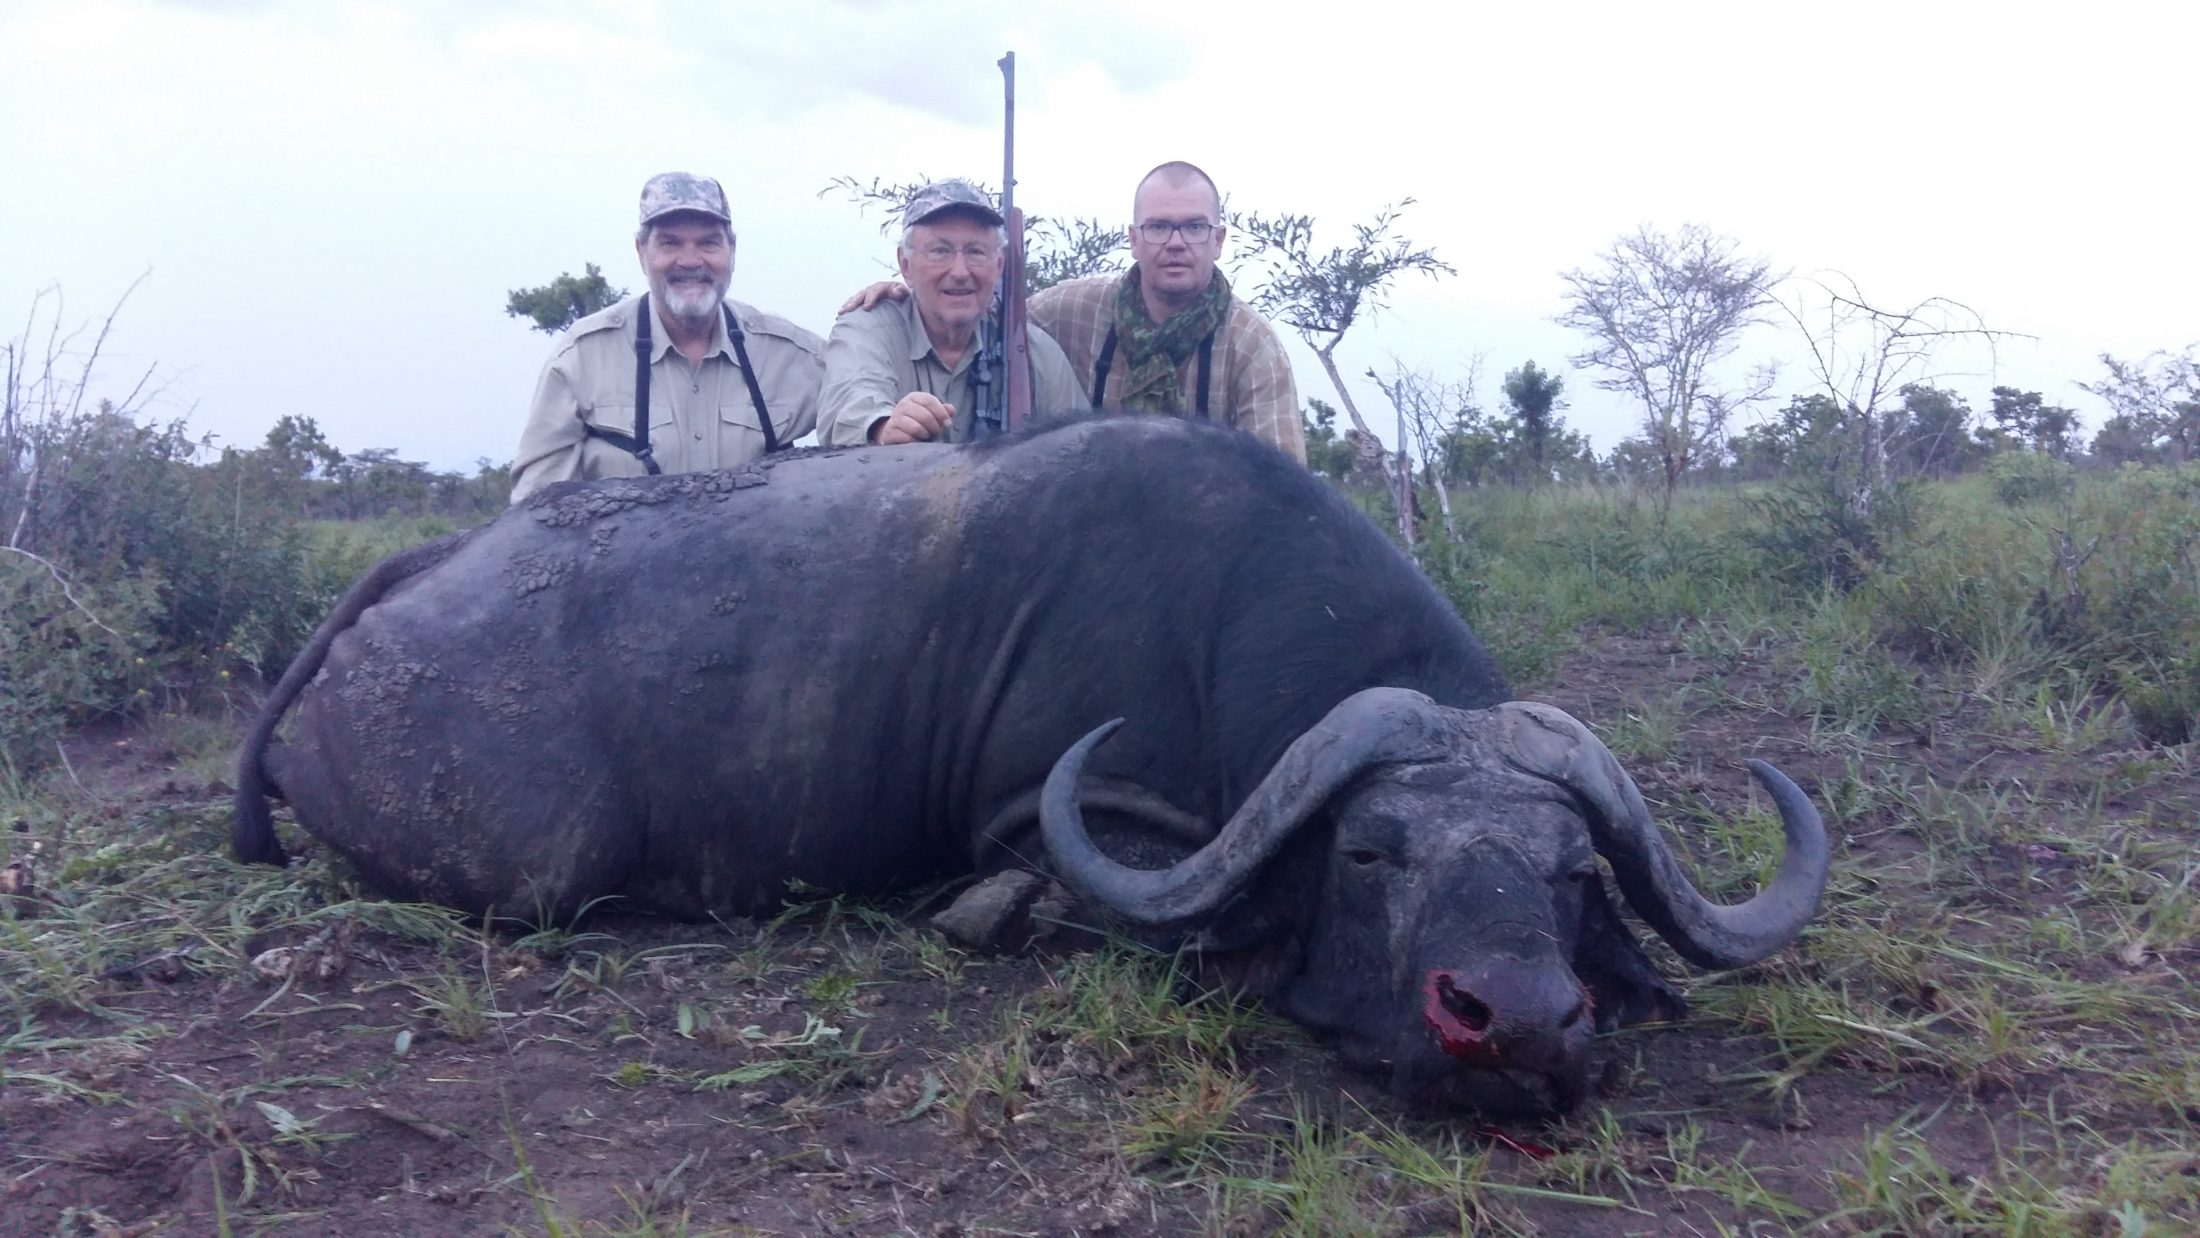 uganda wildlife safaris trophy photos 2017 (4) buffalo